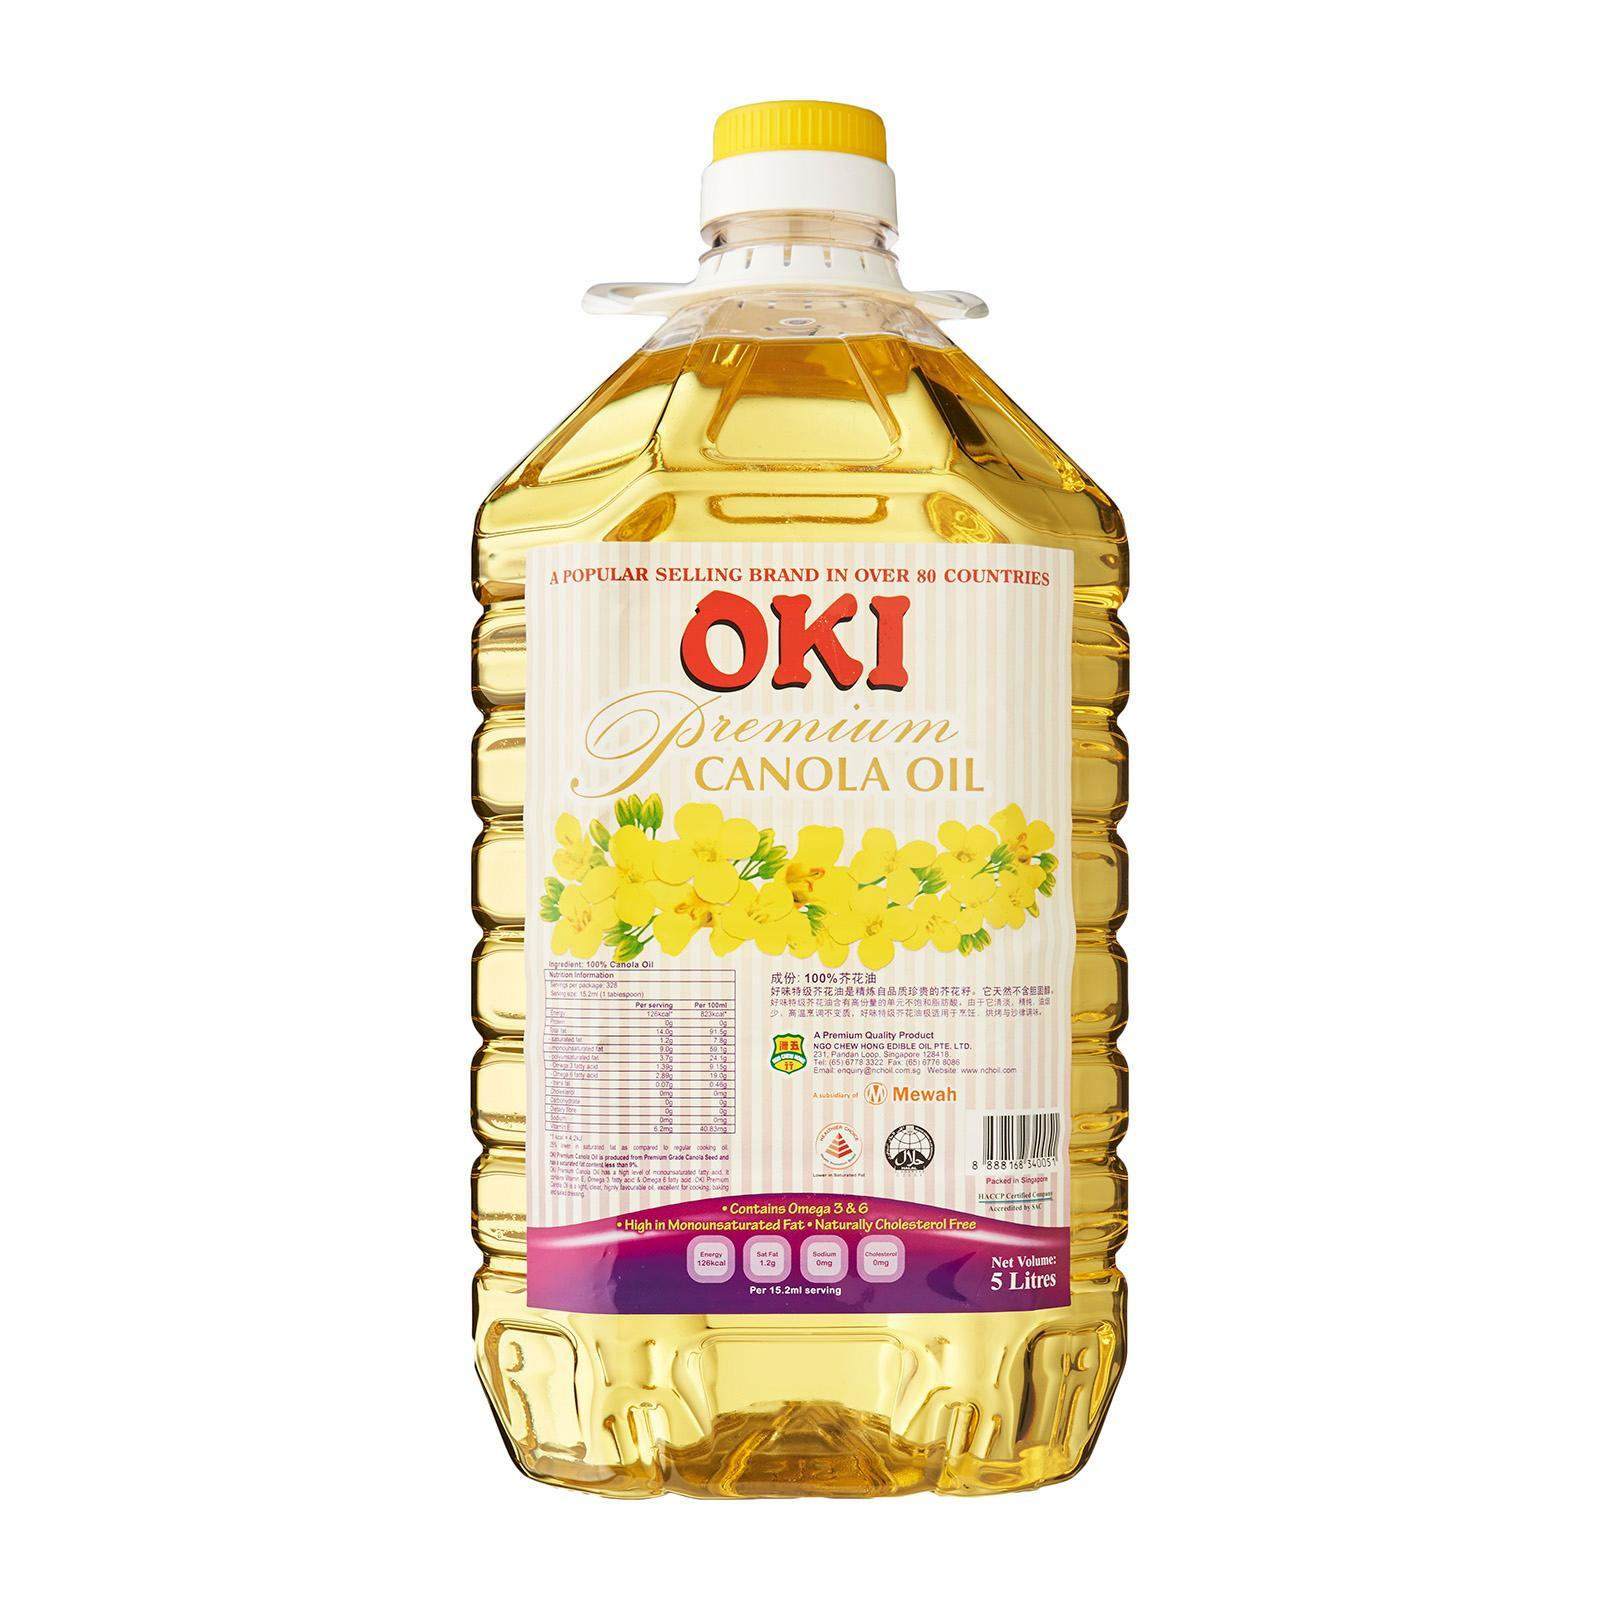 Oki Premium Canola Oil By Redmart.